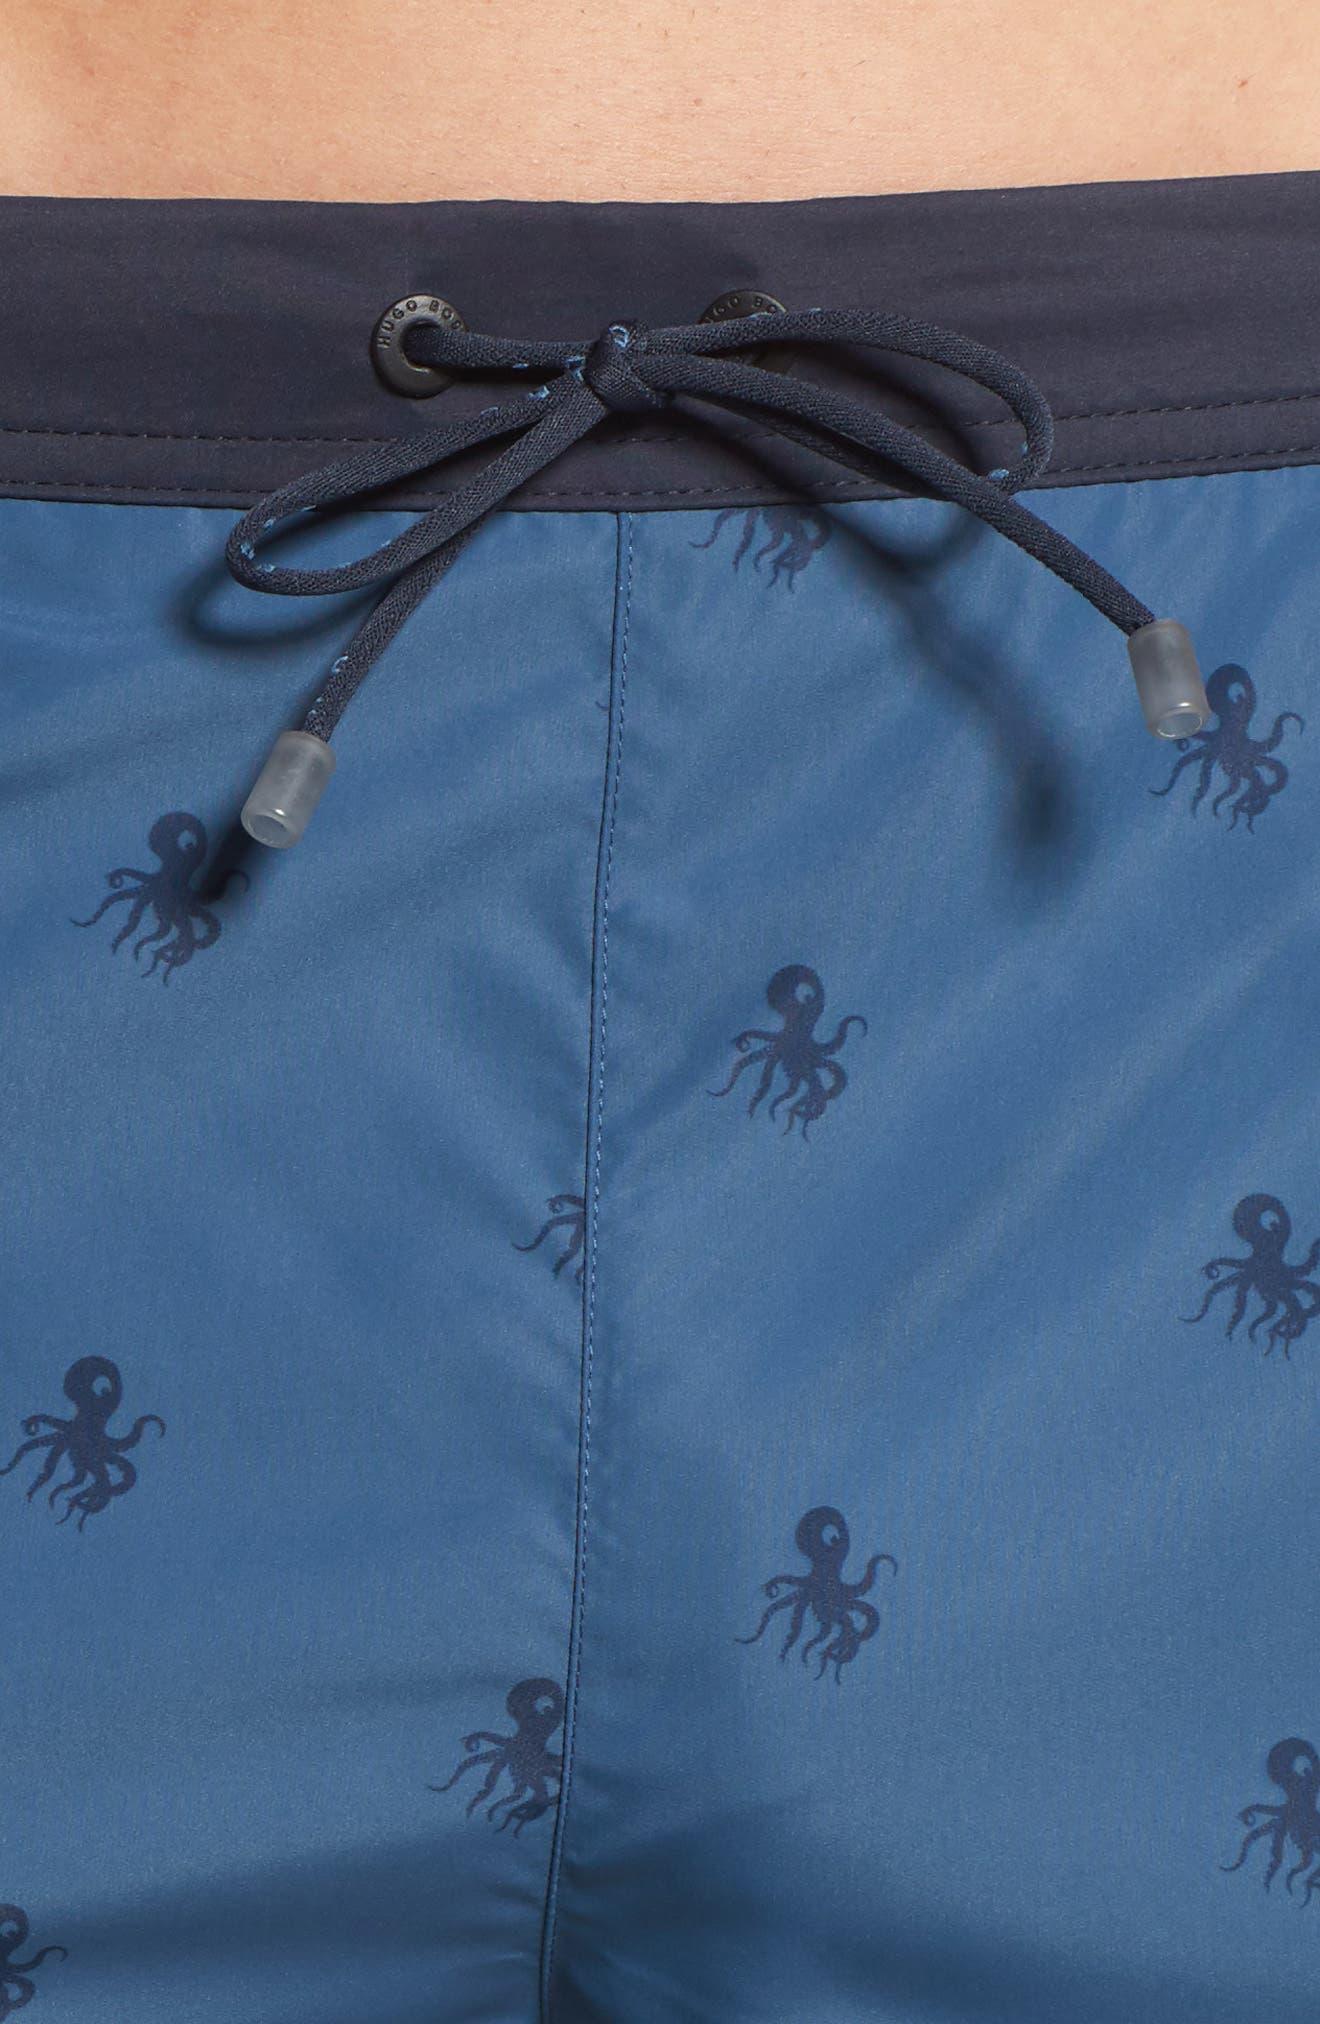 Ropefish Print Swim Trunks,                             Alternate thumbnail 9, color,                             Blue